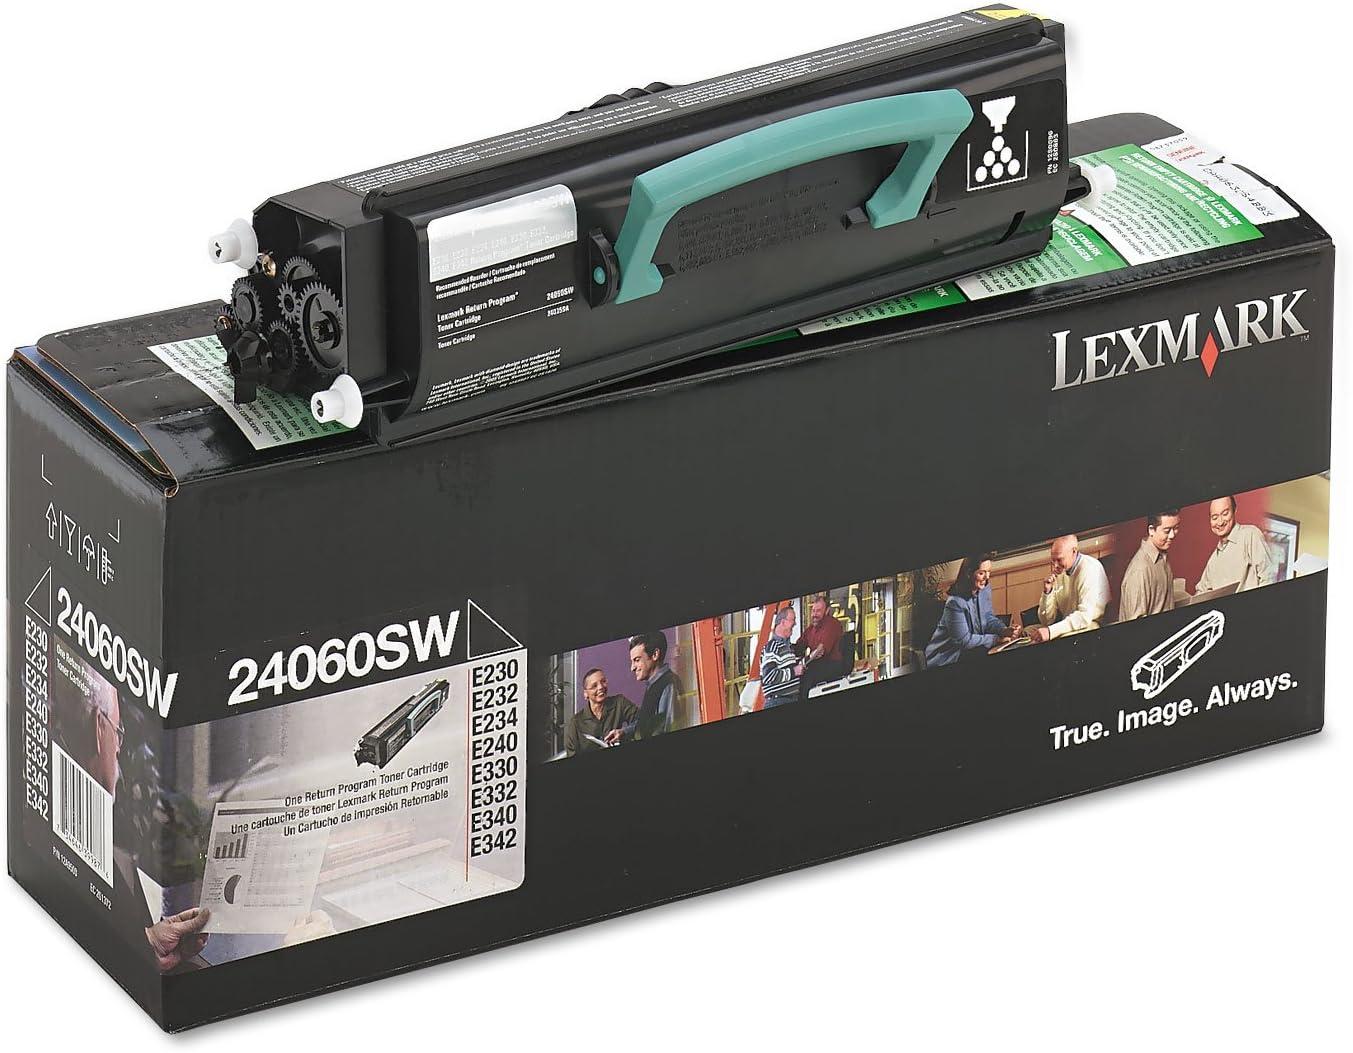 Lexmark 24060SW 24060SW Toner, 2500 Page-Yield, Black